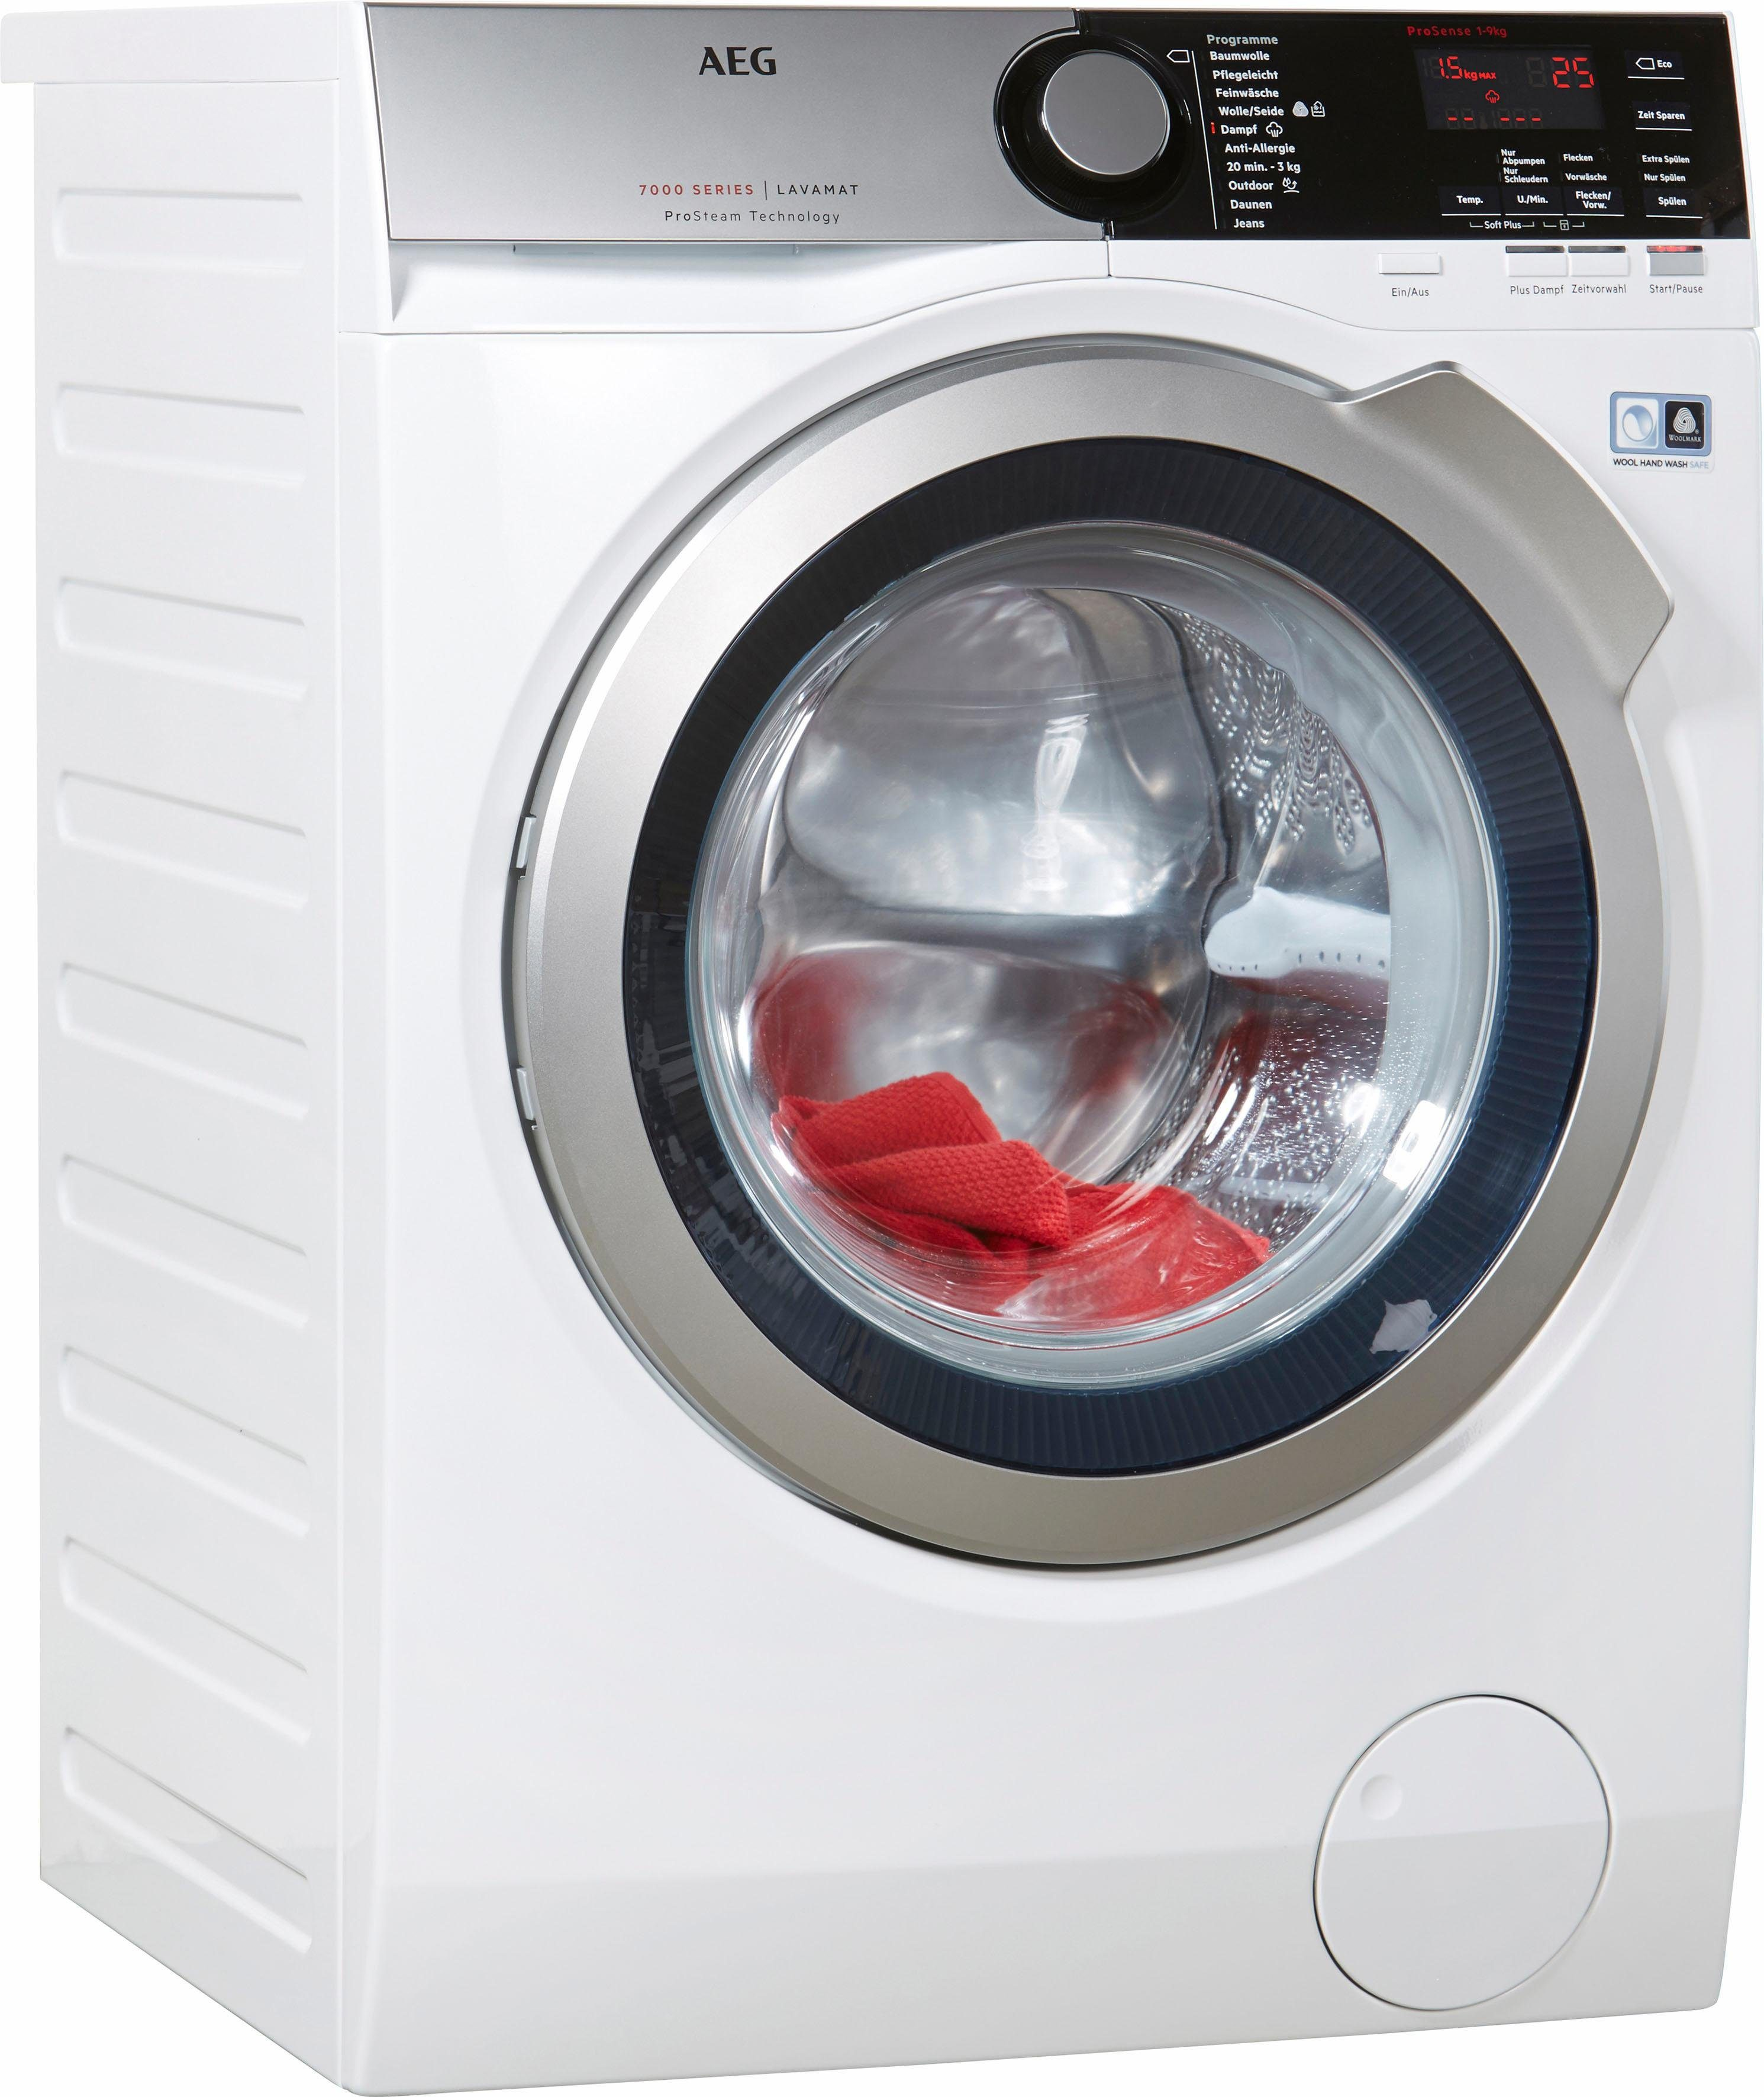 AEG Waschmaschine LAVAMAT L7FE76695, 9 kg, 1600 U/Min